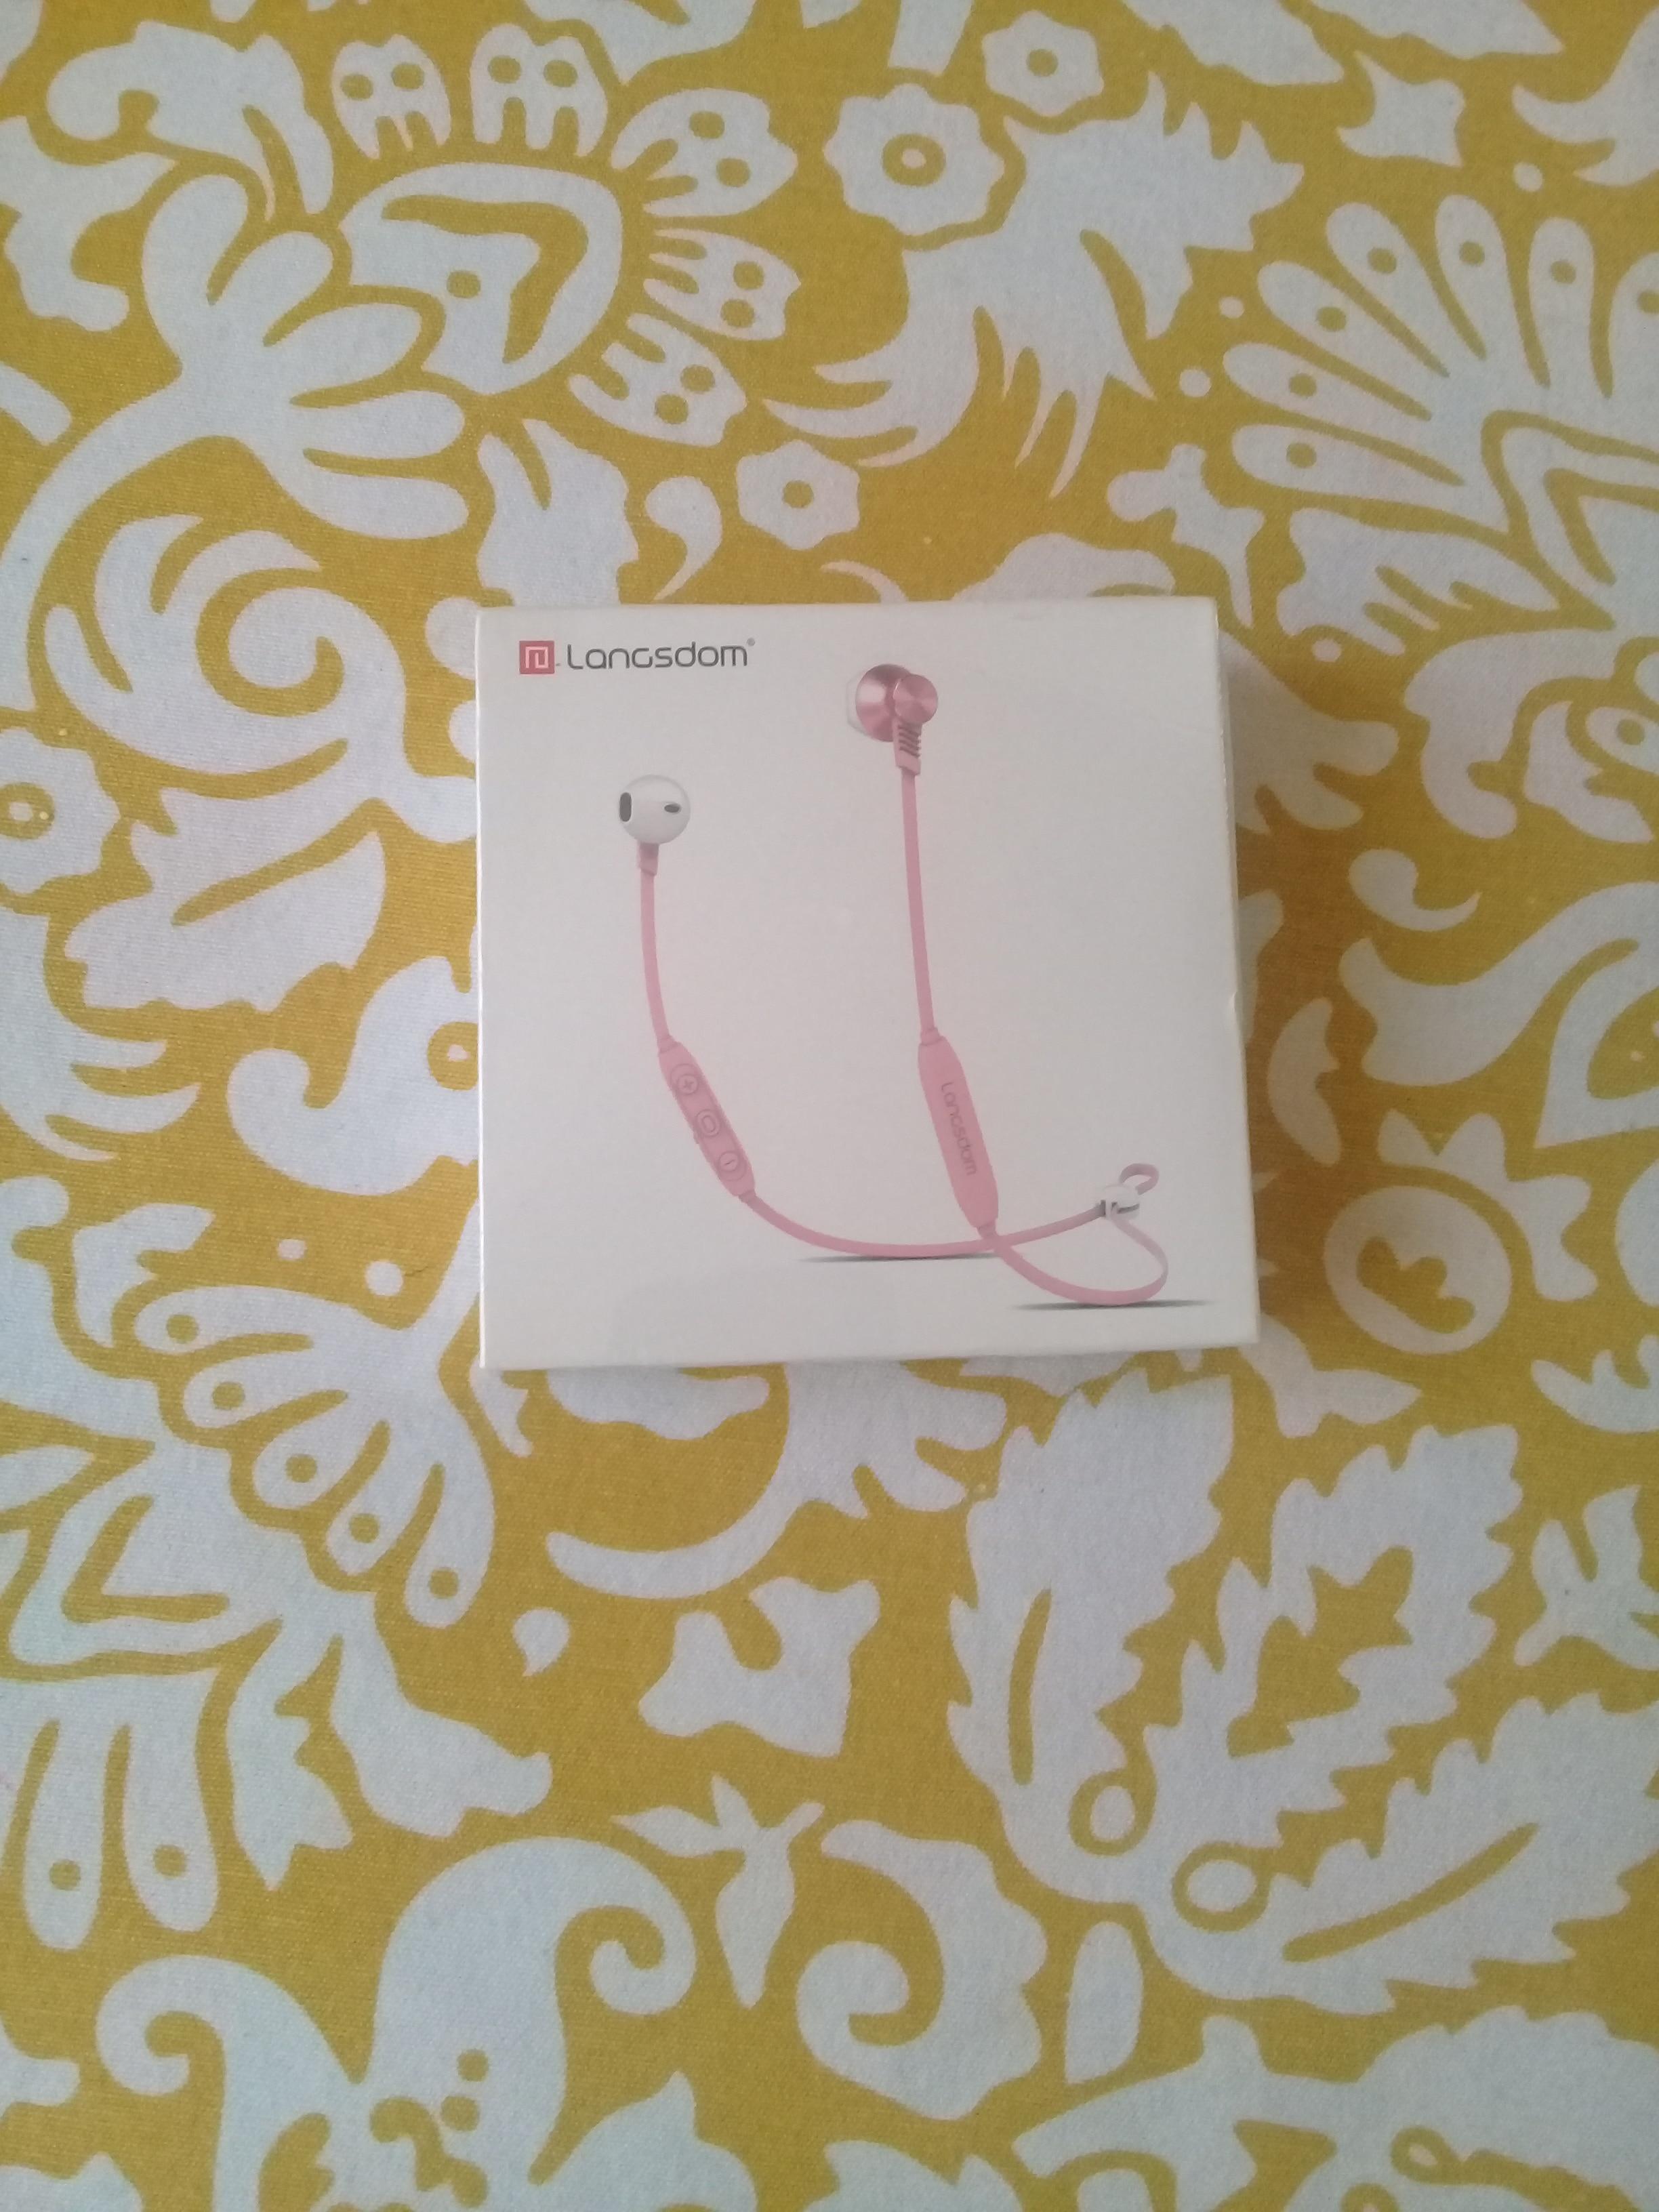 Langsdom Headphone Wireless Bluetooth Earphone for Xiaomi Bass Wireless Headphones with Mic Half In ear Headset Earbud for Phone|Bluetooth Earphones & Headphones| |  - AliExpress